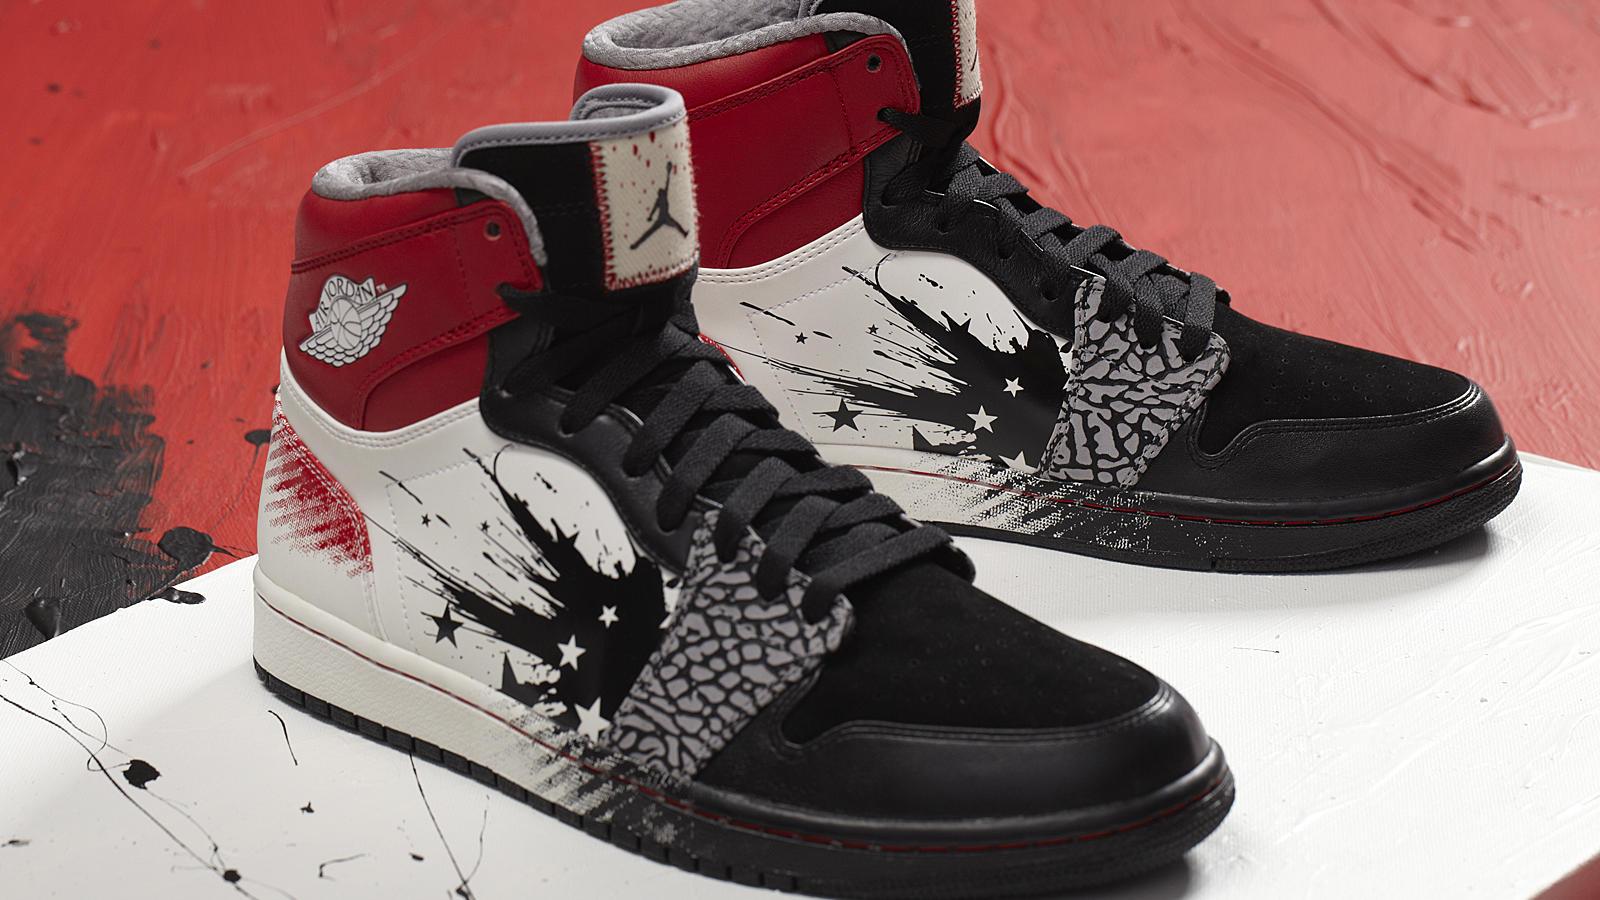 Air Jordan Paint Colorway Shoes